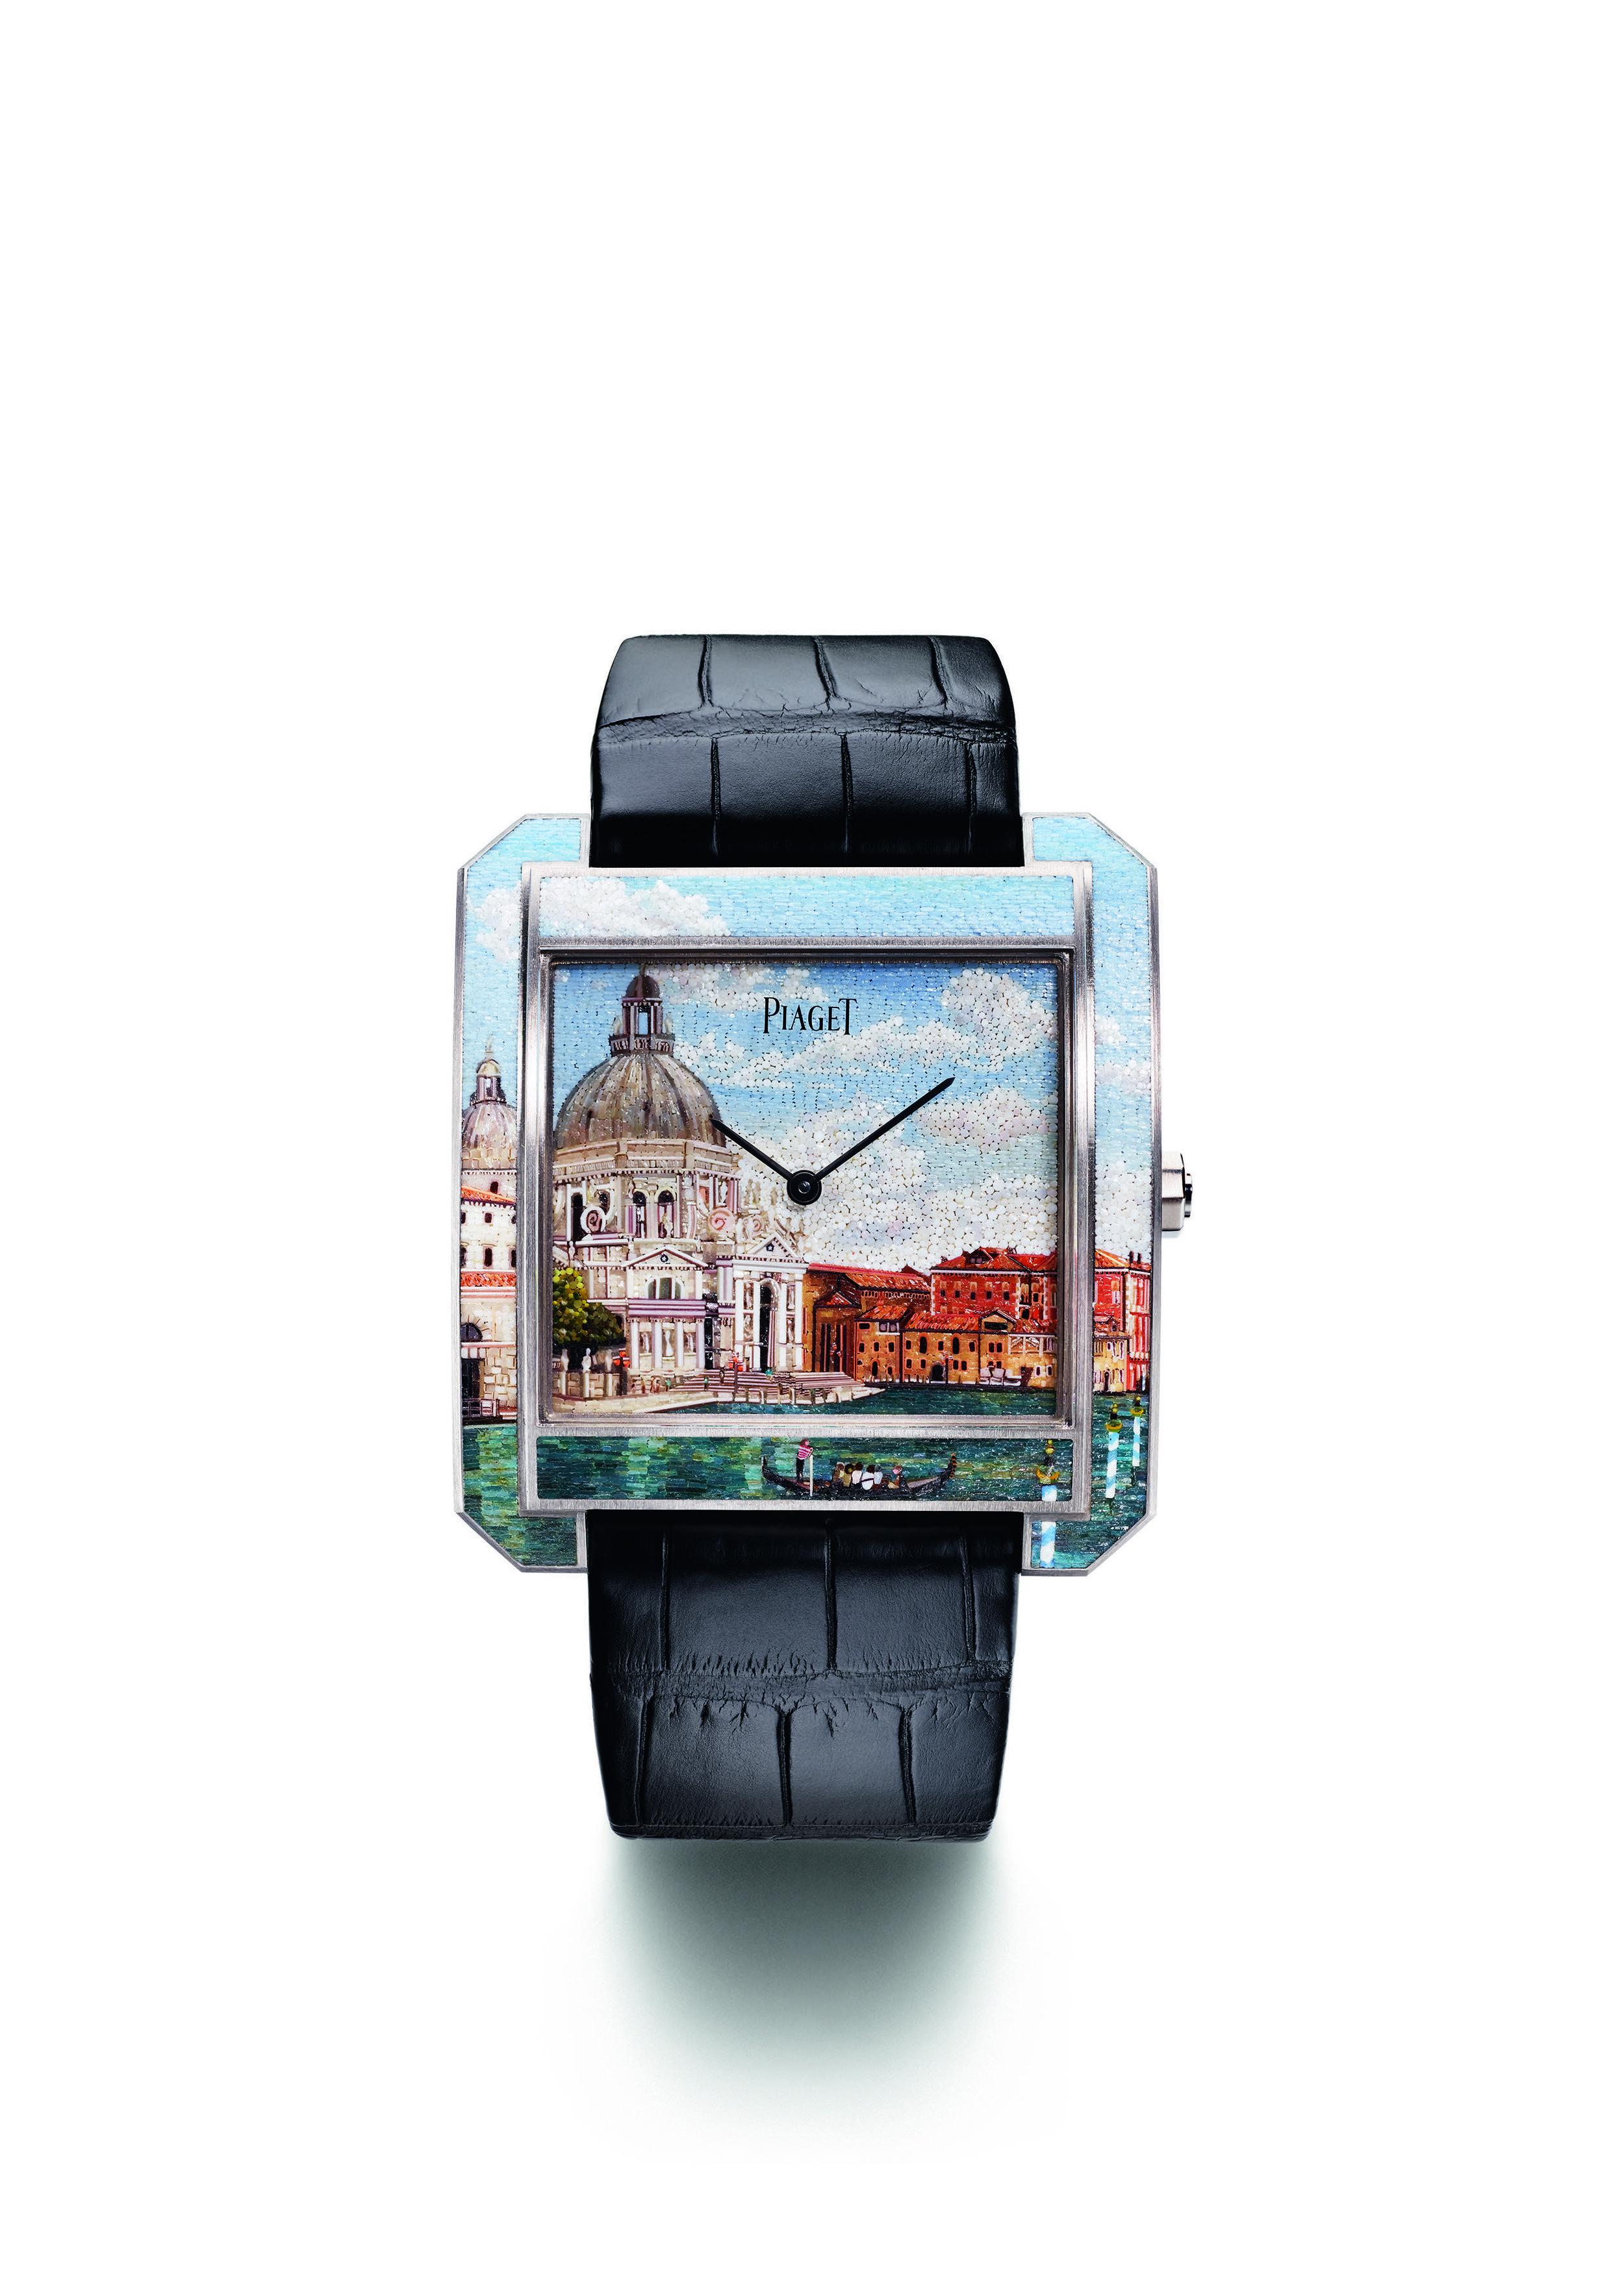 Artistic Crafts Watch Prize: